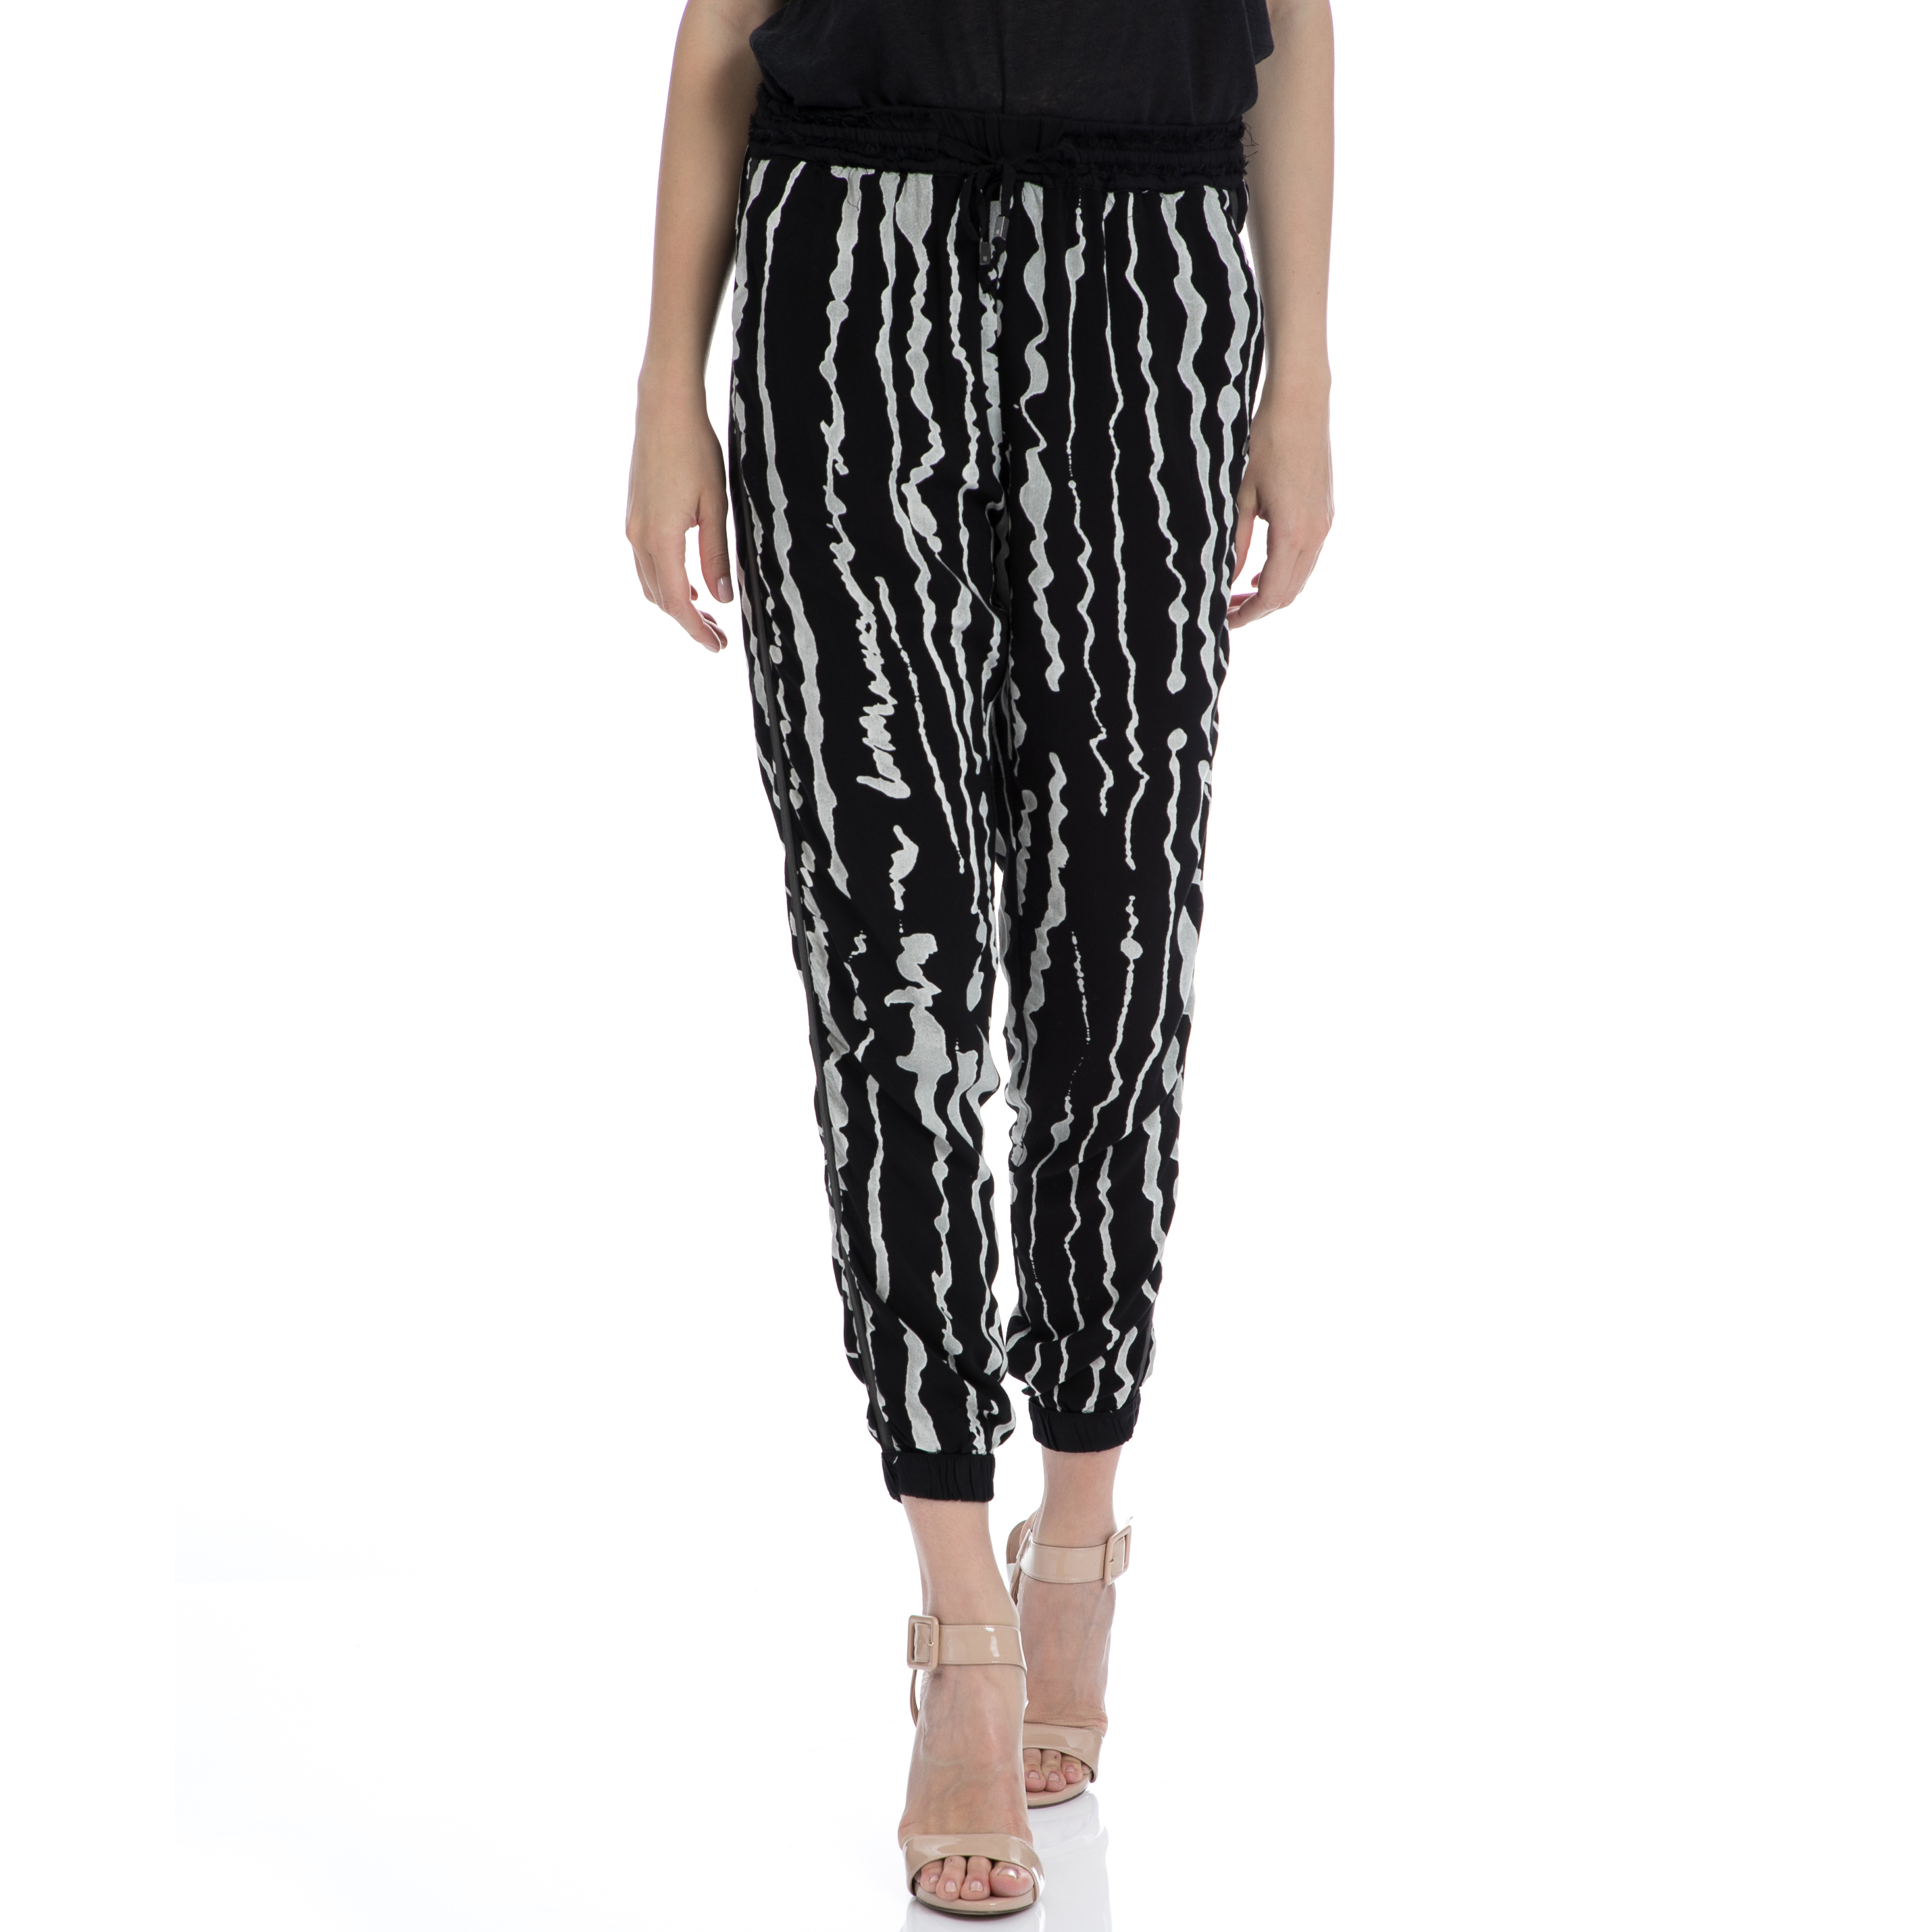 GARCIA JEANS - Γυναικείο παντελόνι Garcia Jeans μαύρο-γκρι γυναικεία ρούχα παντελόνια casual